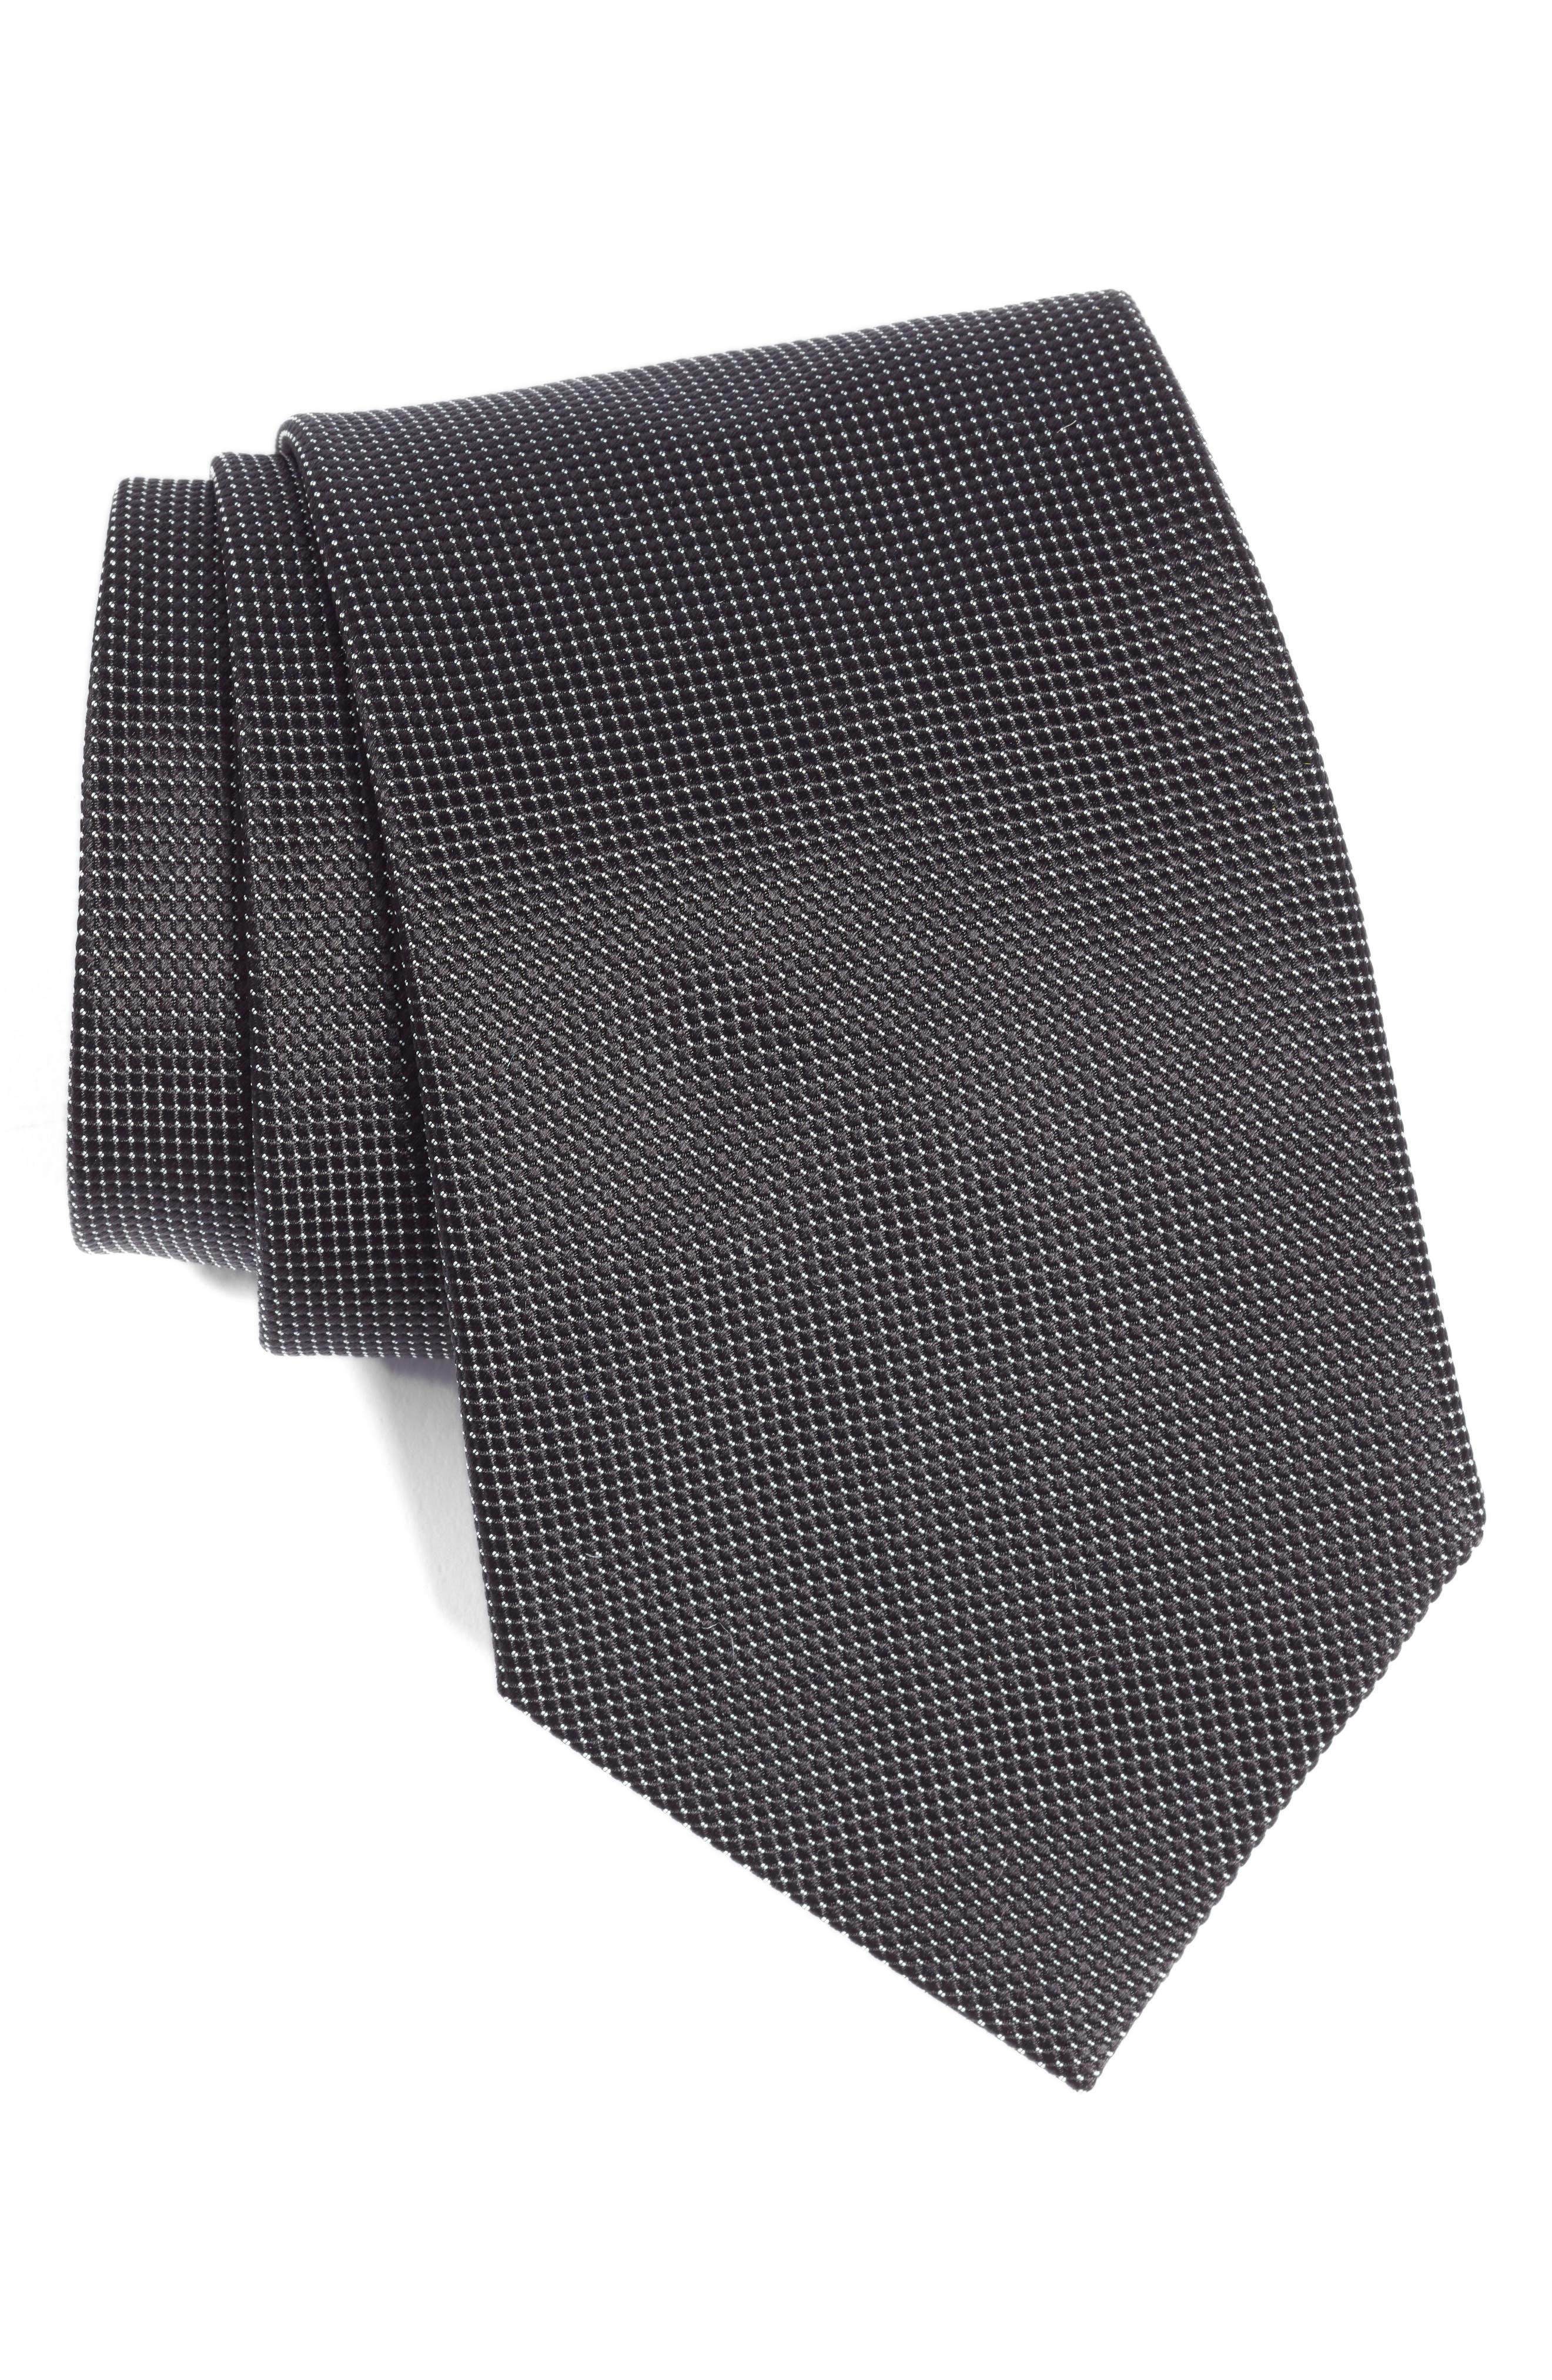 Solid Jacquard Silk Tie,                             Main thumbnail 1, color,                             BLACK